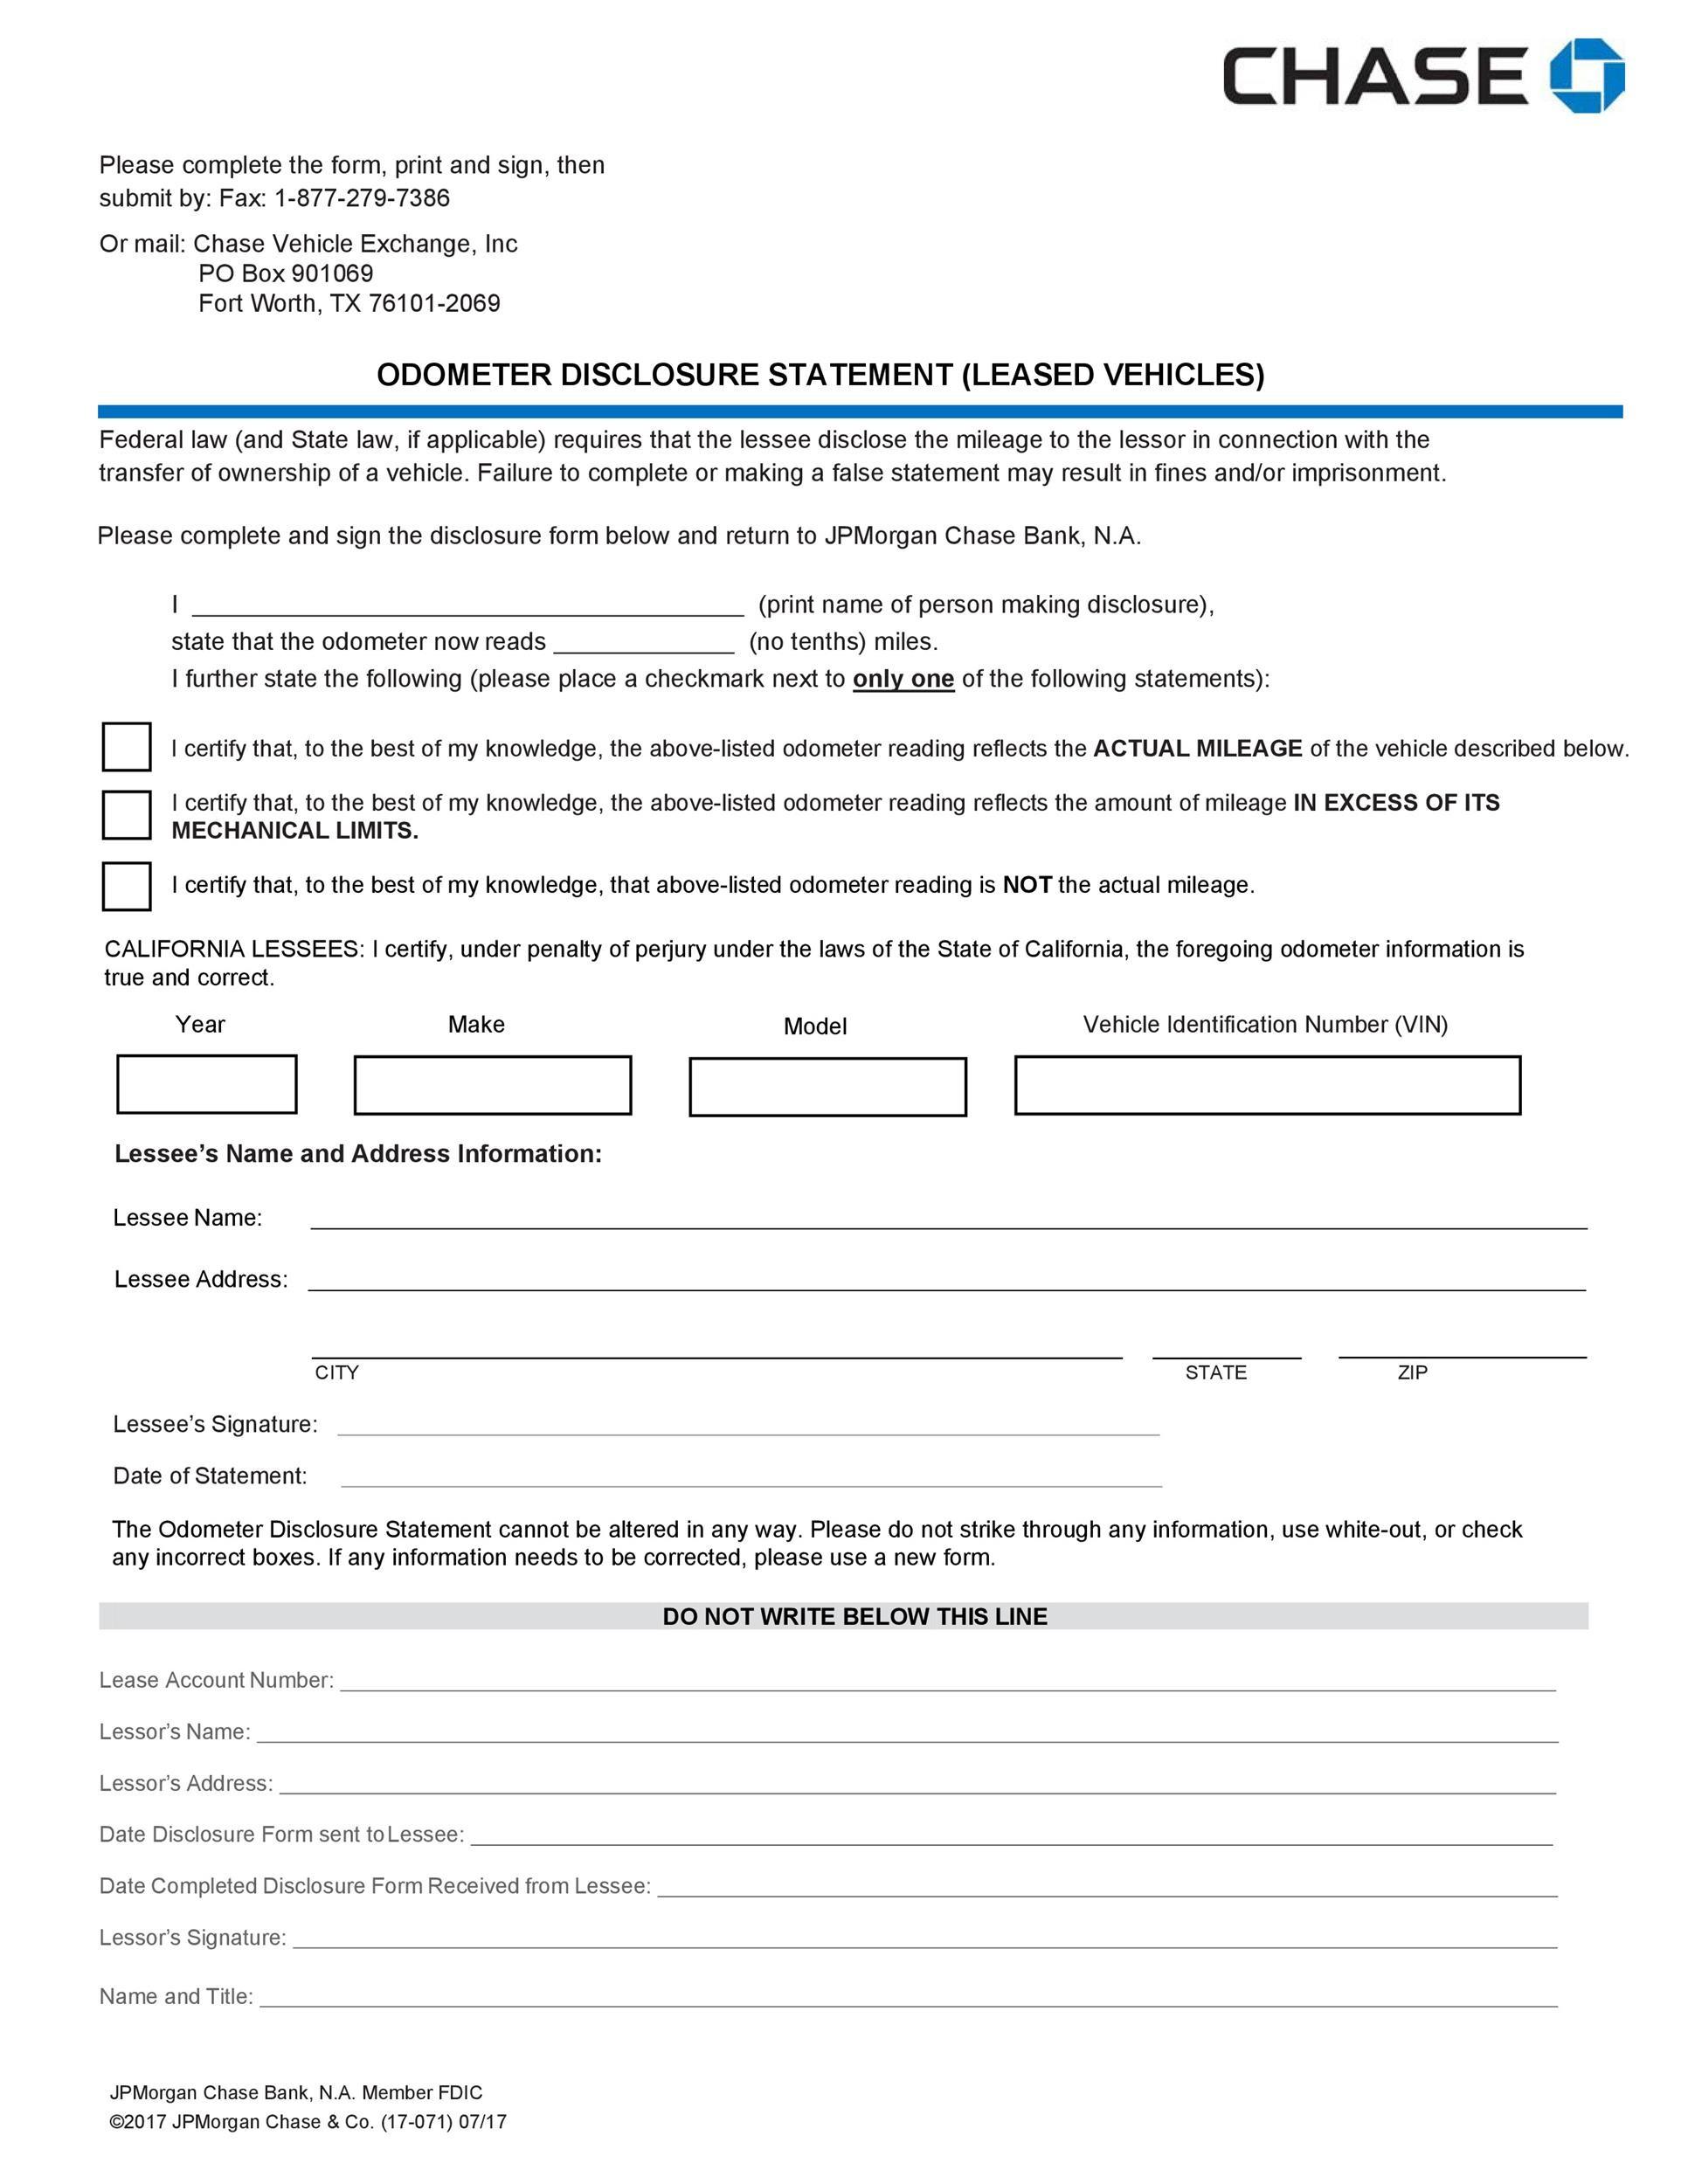 Free odometer disclosure statement 29